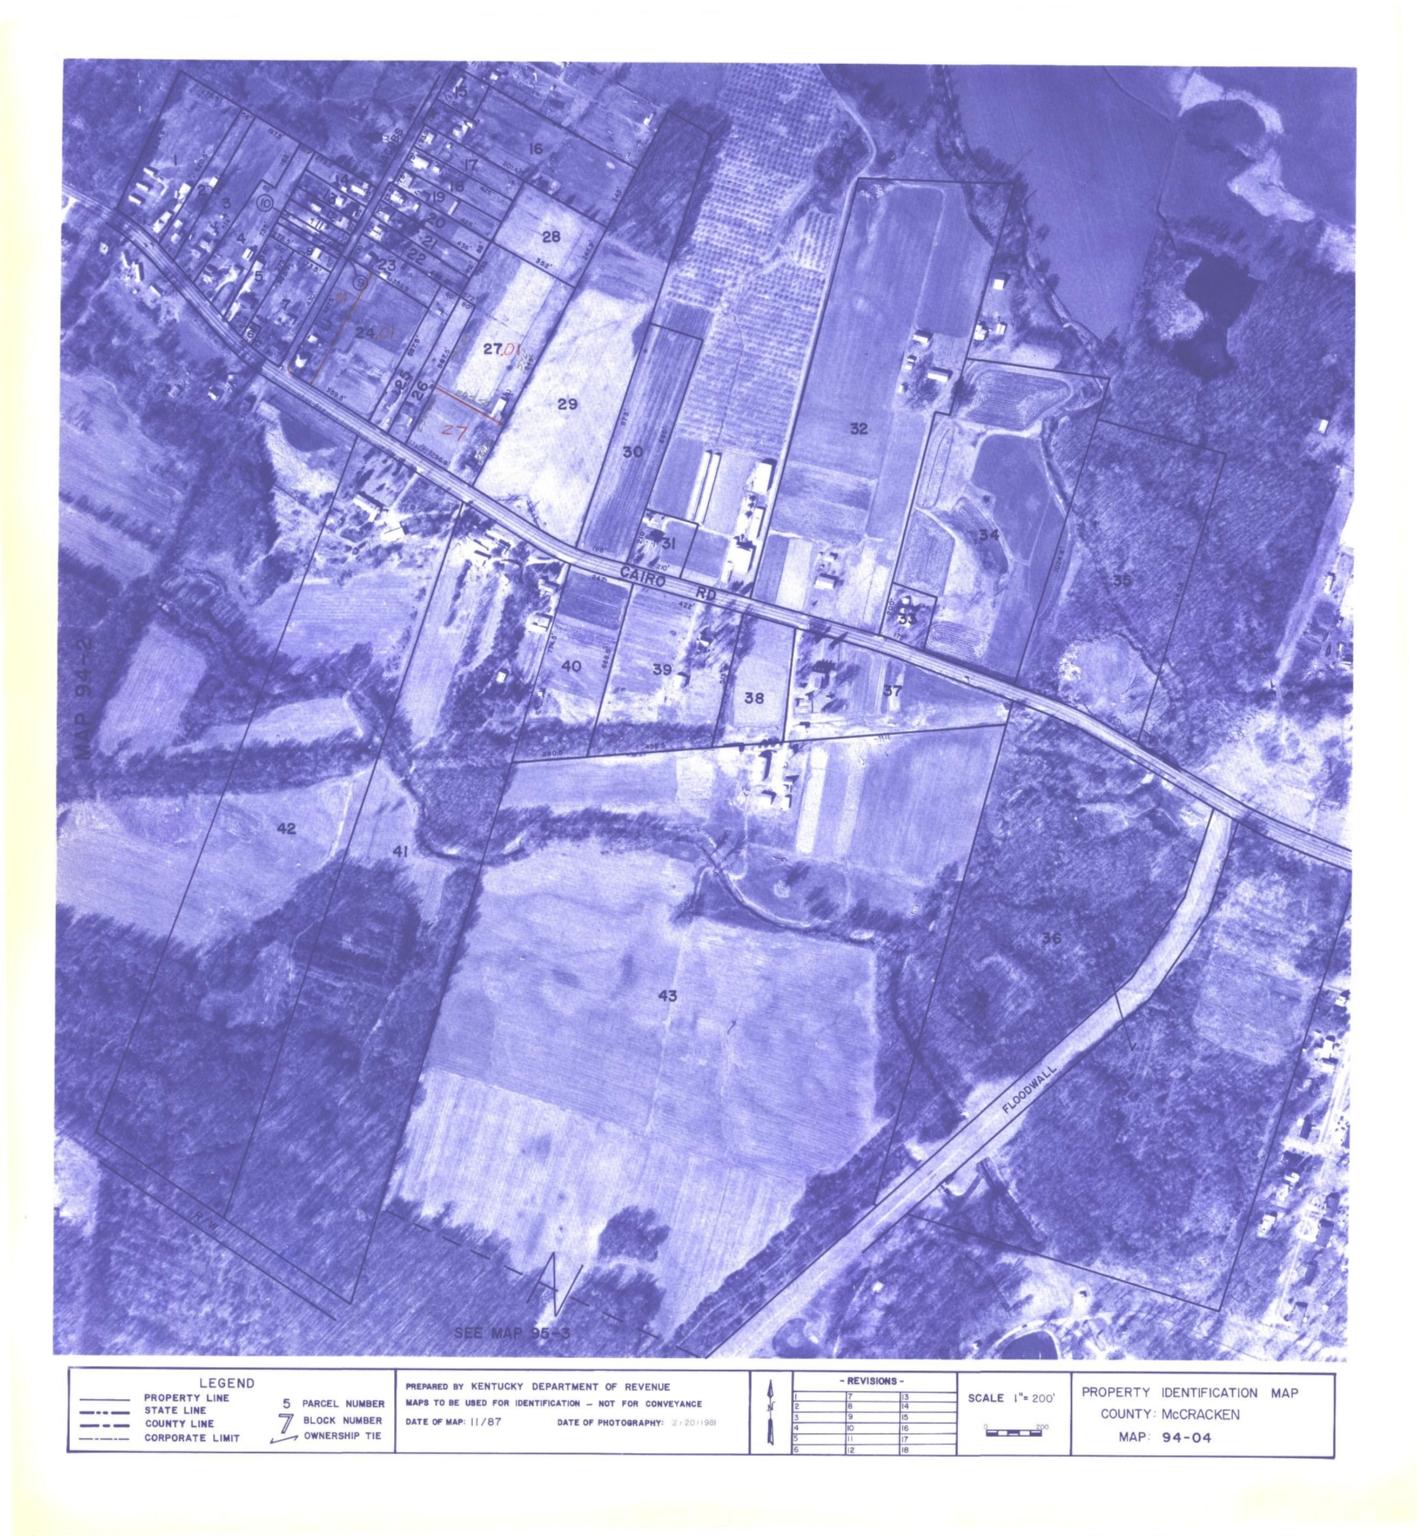 Property Identification Map McCracken County, Map 94-04